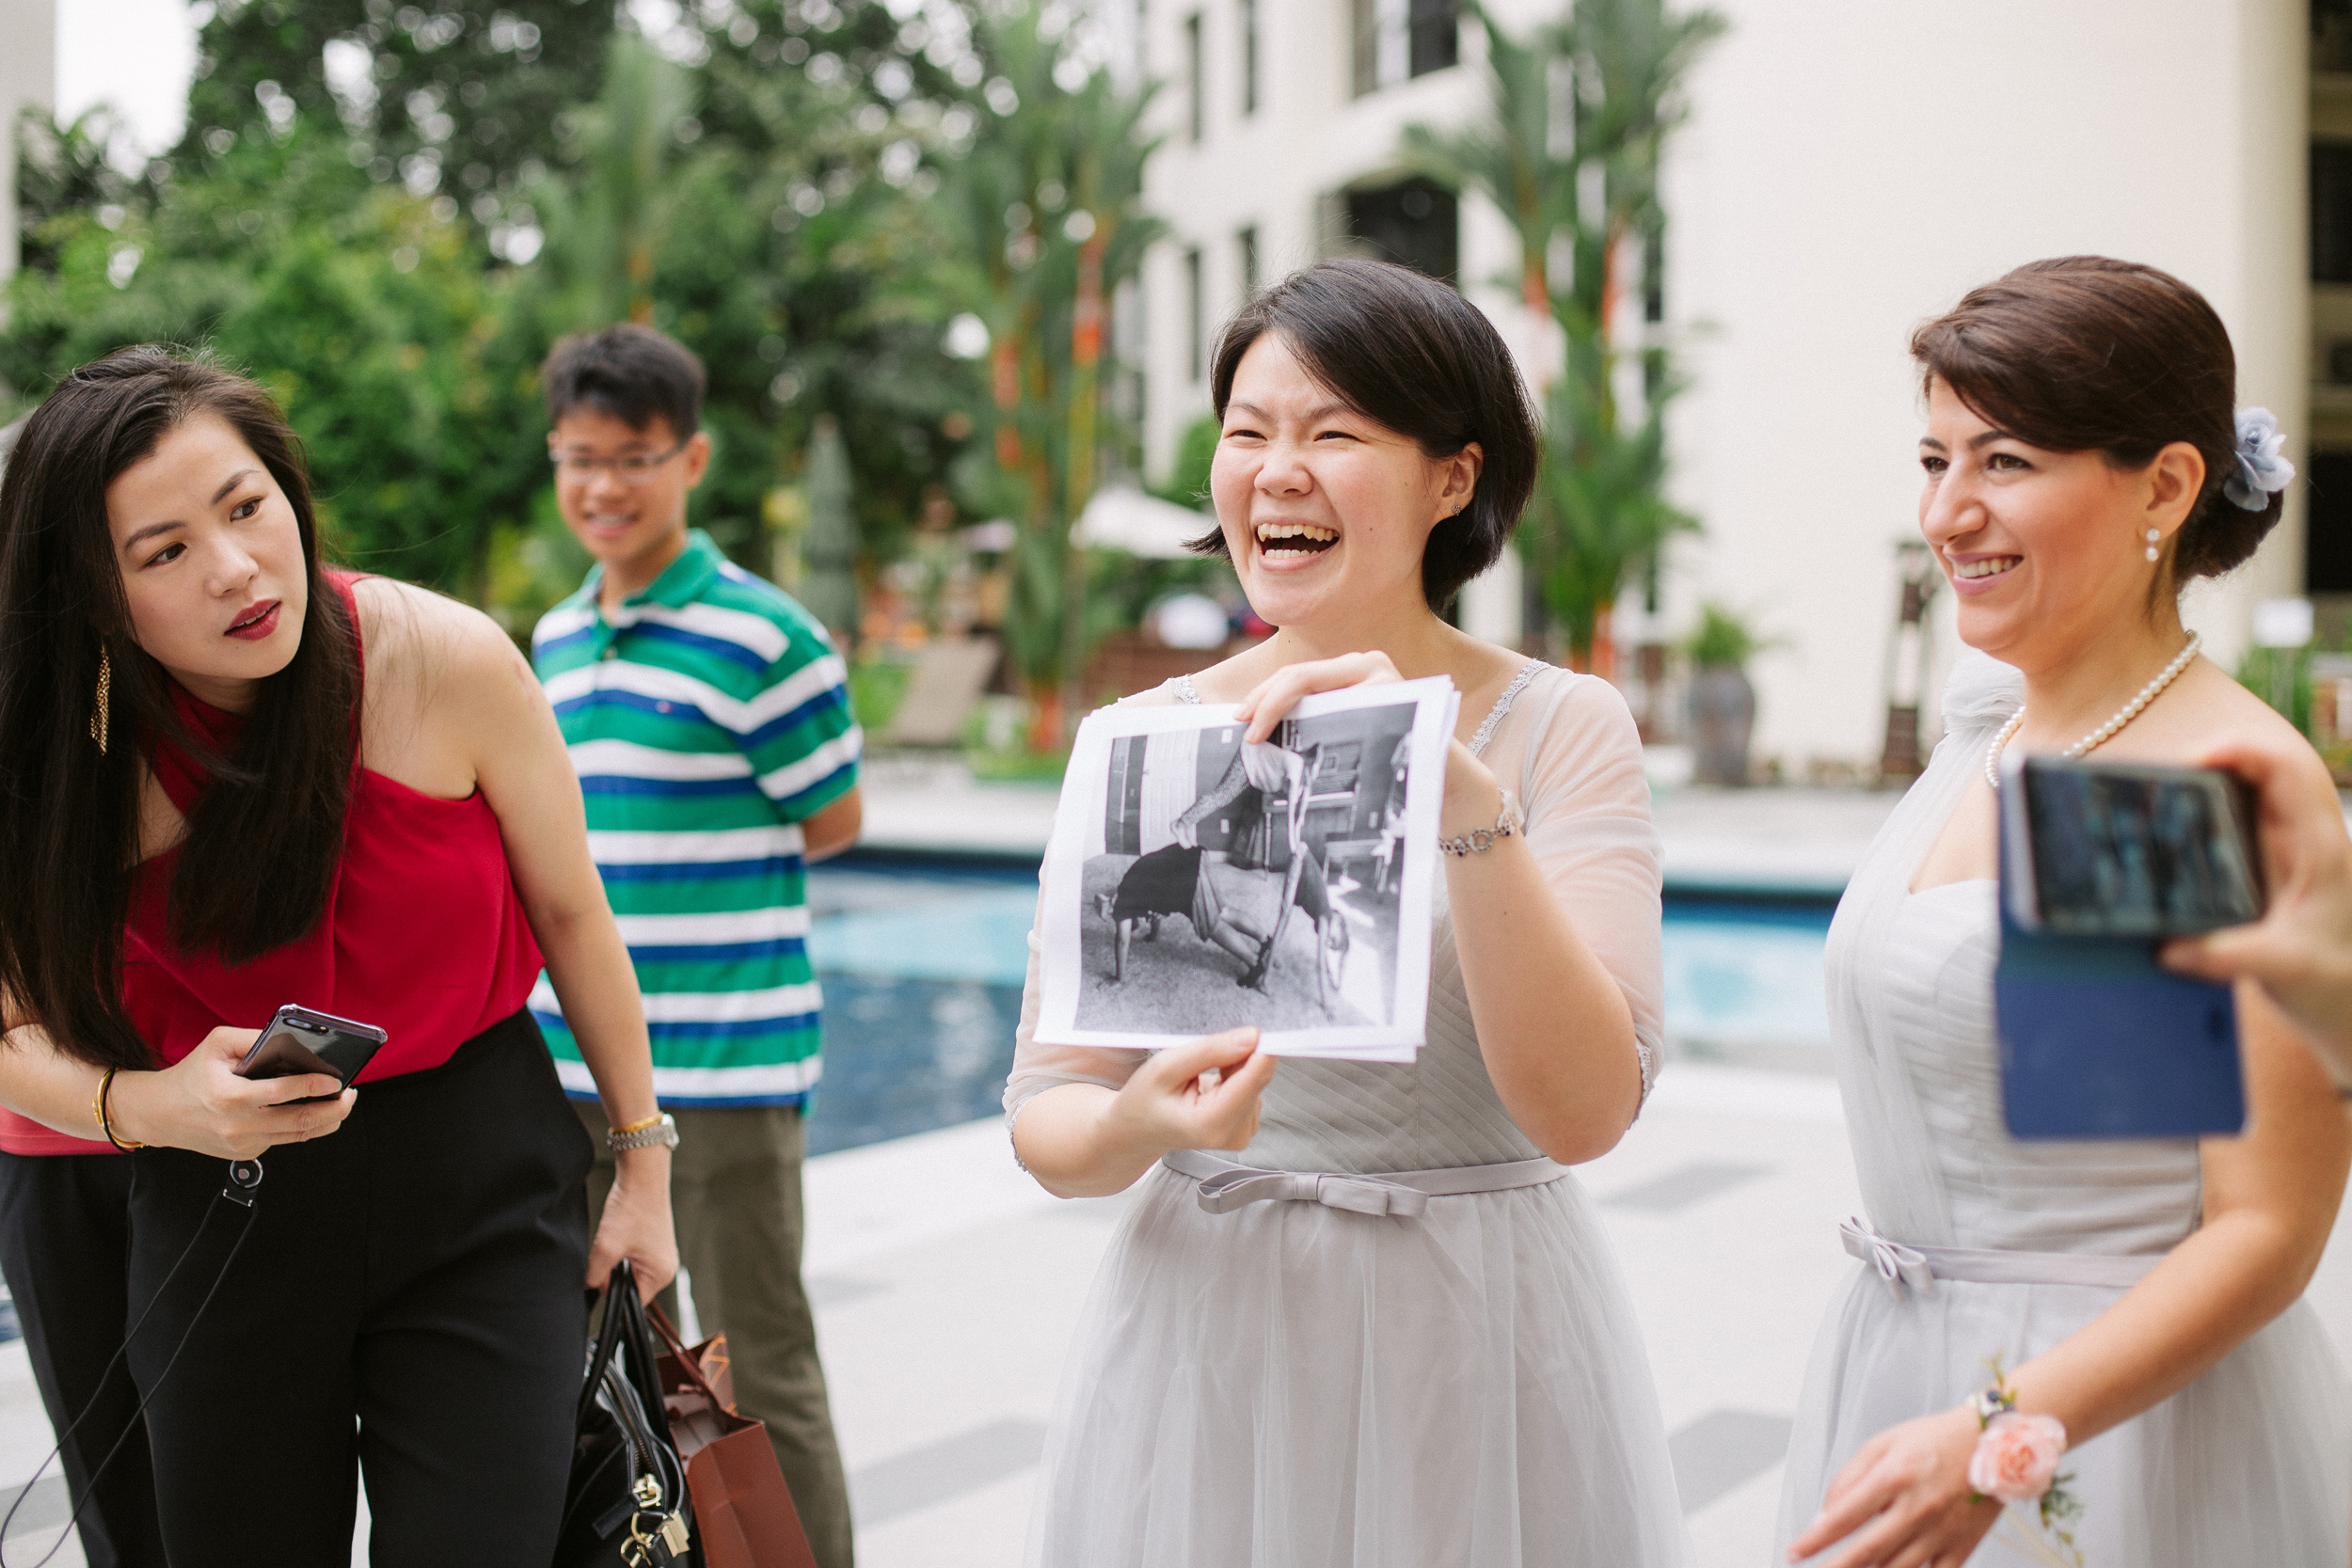 singapore-wedding-photographer-cheryl-matthew-fullerton-hotel-wedding-12.jpg